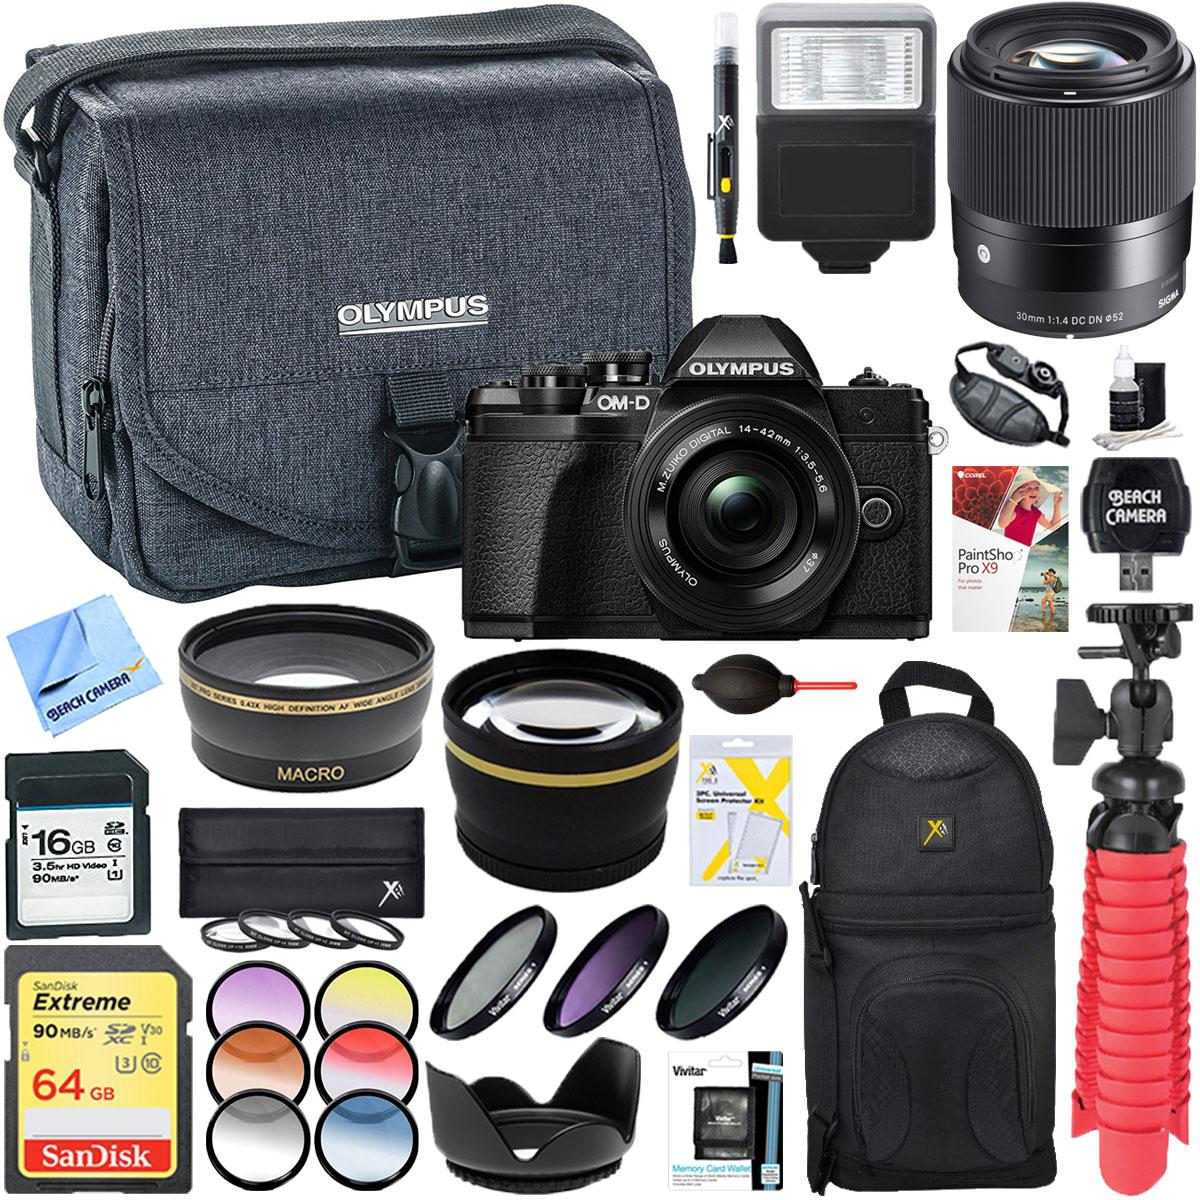 Olympus OM-D E-M10 Mark III Mirrorless Digital Camera (Black) with 14-42mm EZ & Sigma 30mm Lens Deluxe... by Olympus